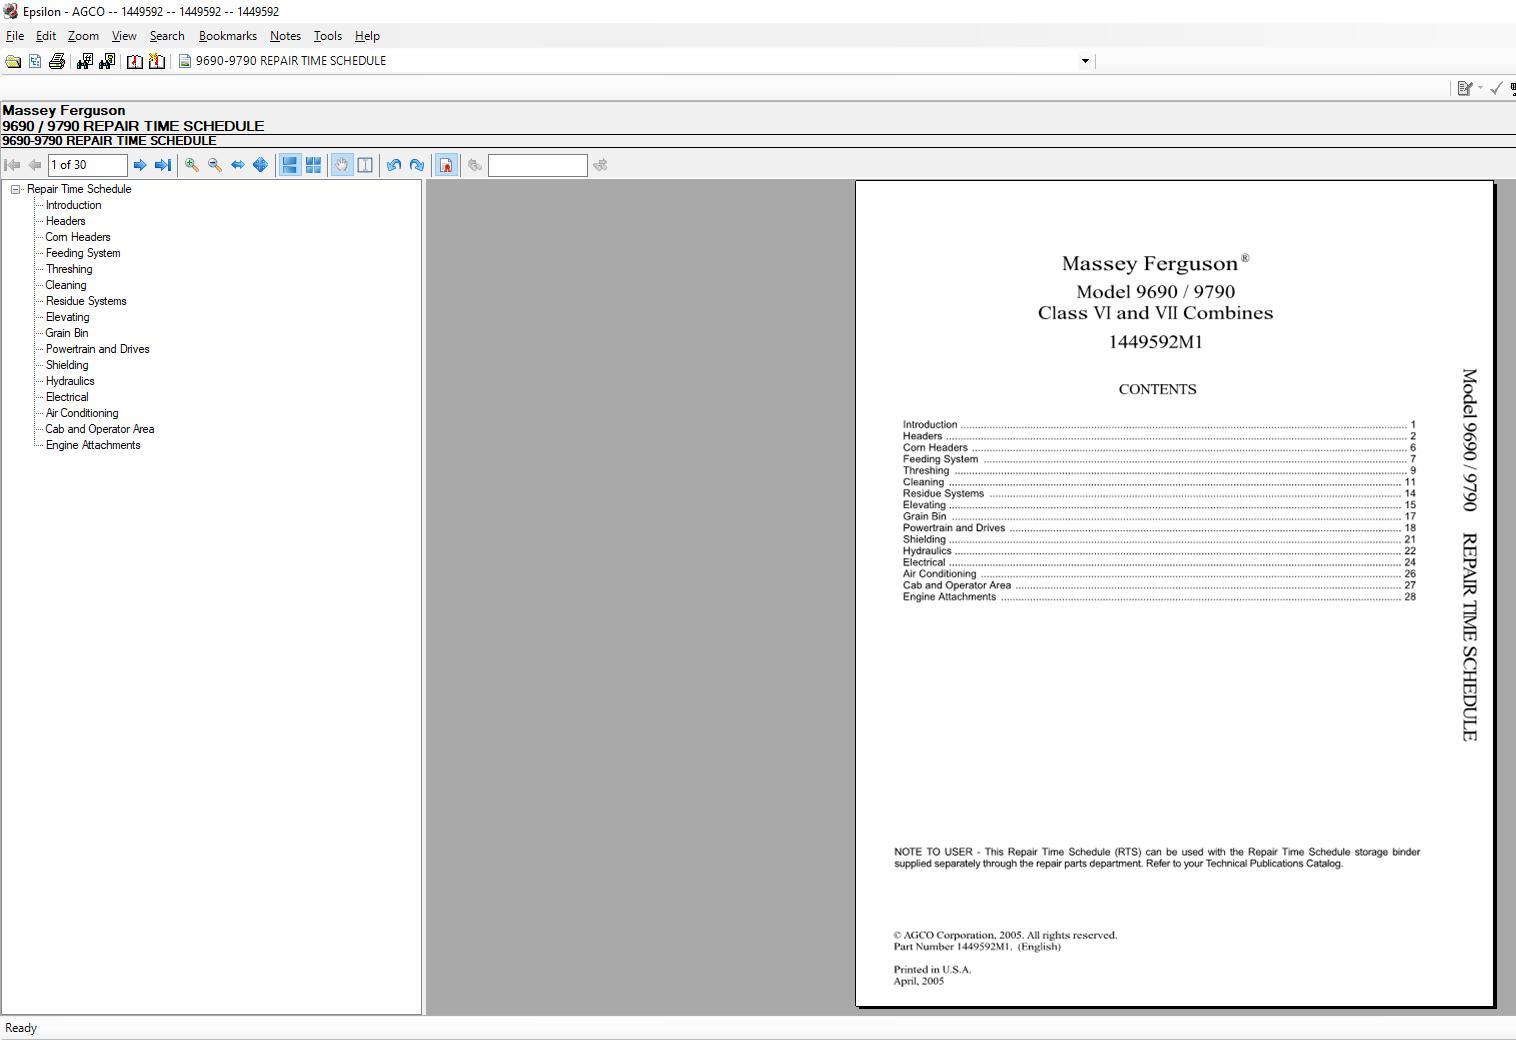 Massey_Ferguson_NA_AG_North_America_052019_Part_Book_Workshop_Service_Manuals8